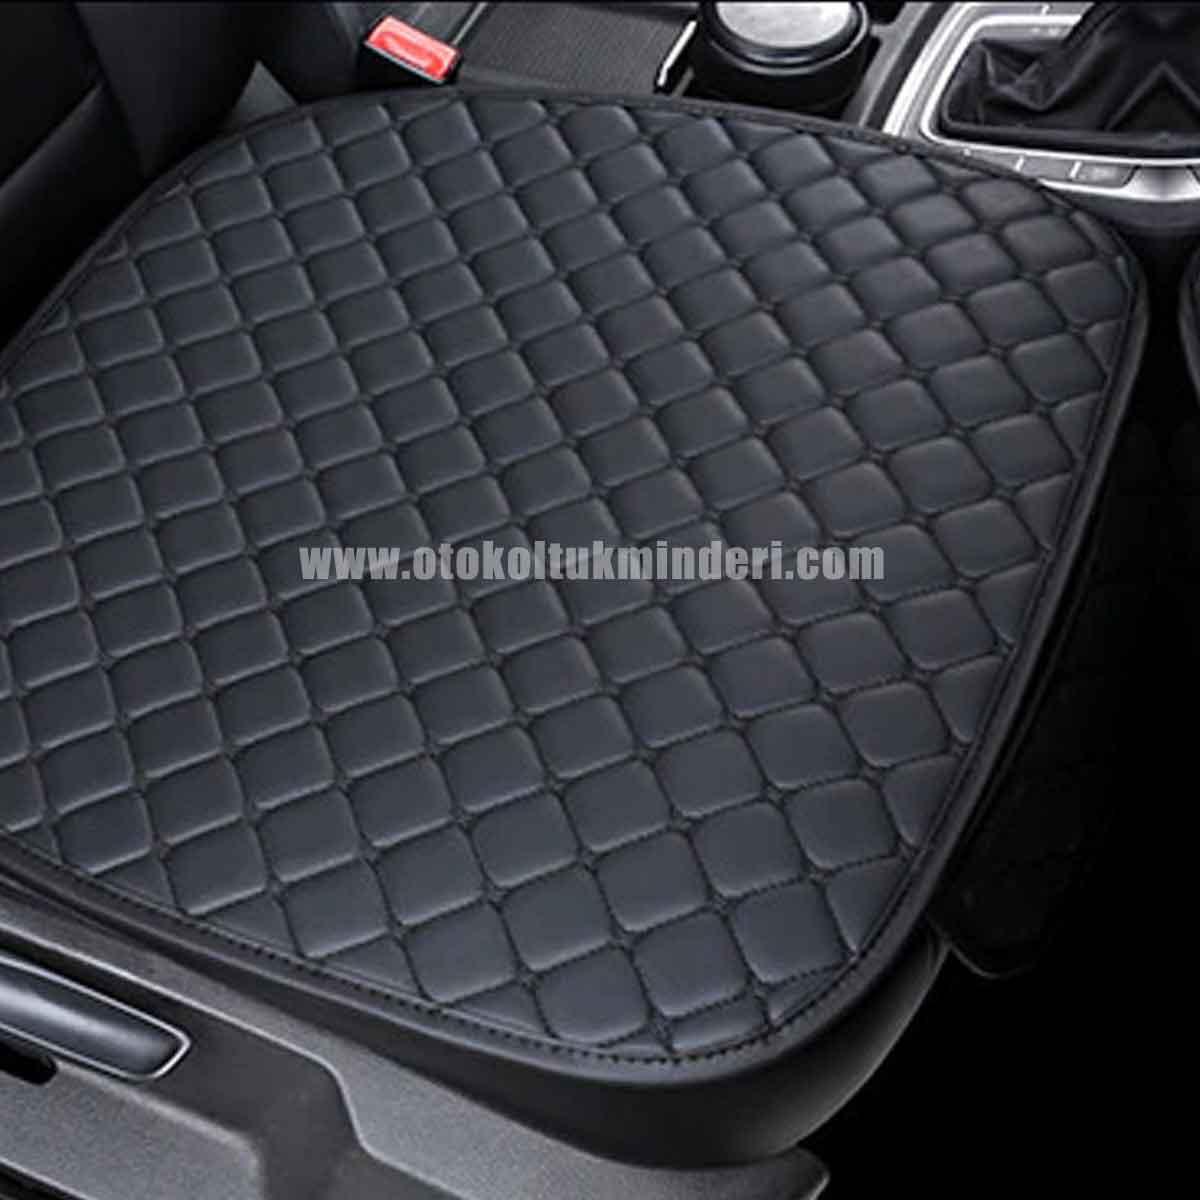 Hyundai oto koltuk kılıfı